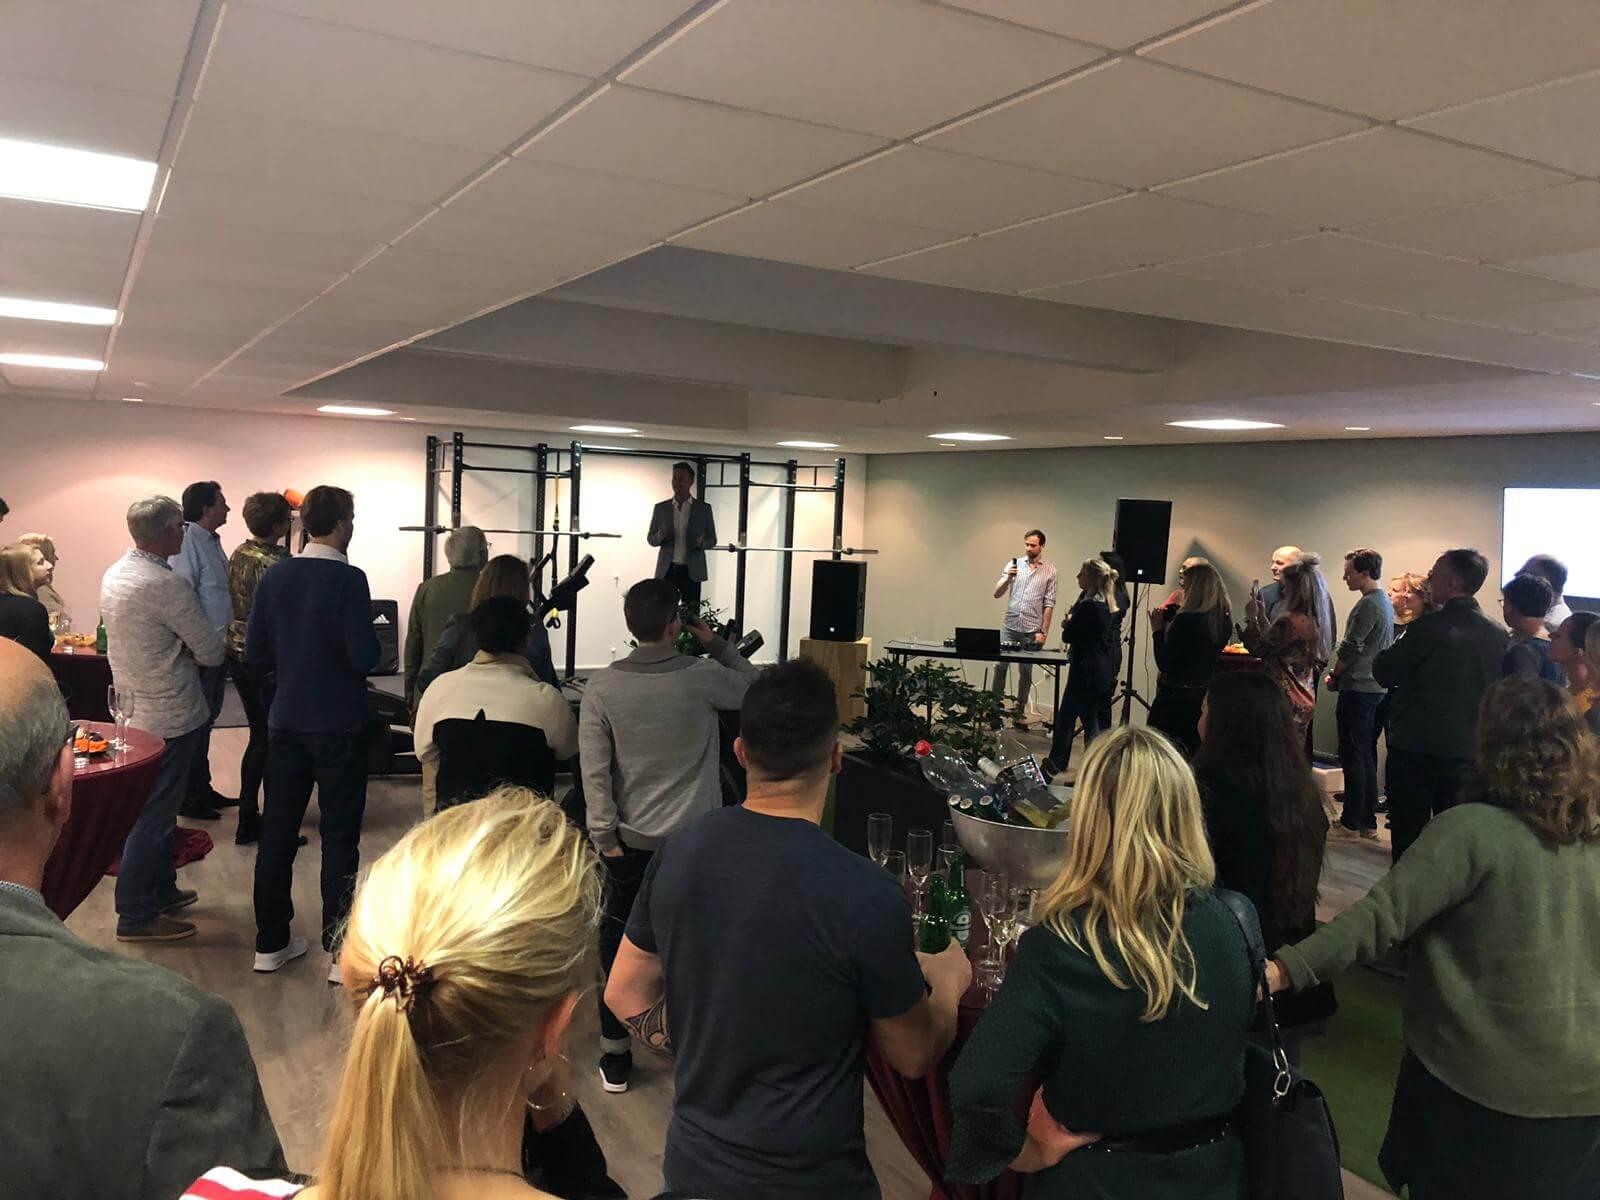 Personal Fit Club - De eerste club voor personal training in Zoetermeer is open (5)